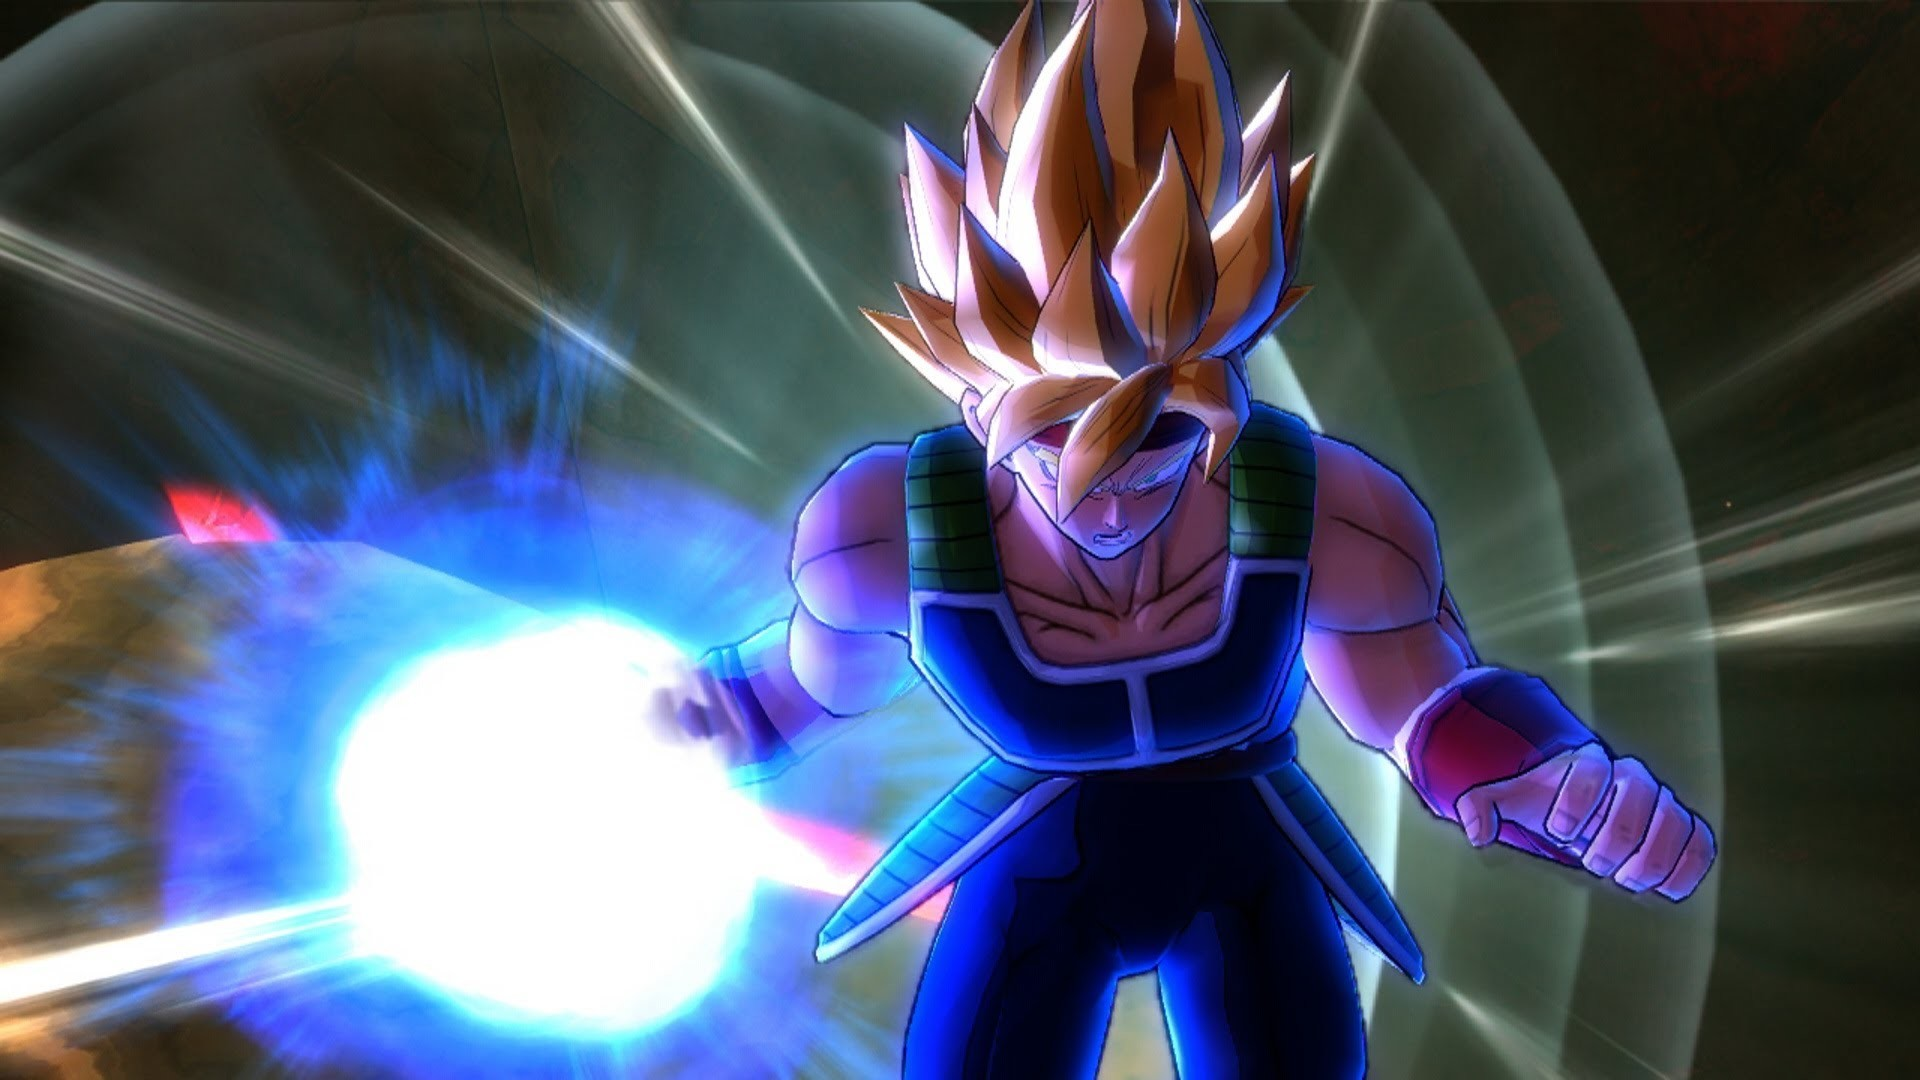 Dragon Ball Z Battle of Z – | New Screenshots #7 & Artwork Super Saiyan  Bardock | 【FULL HD】